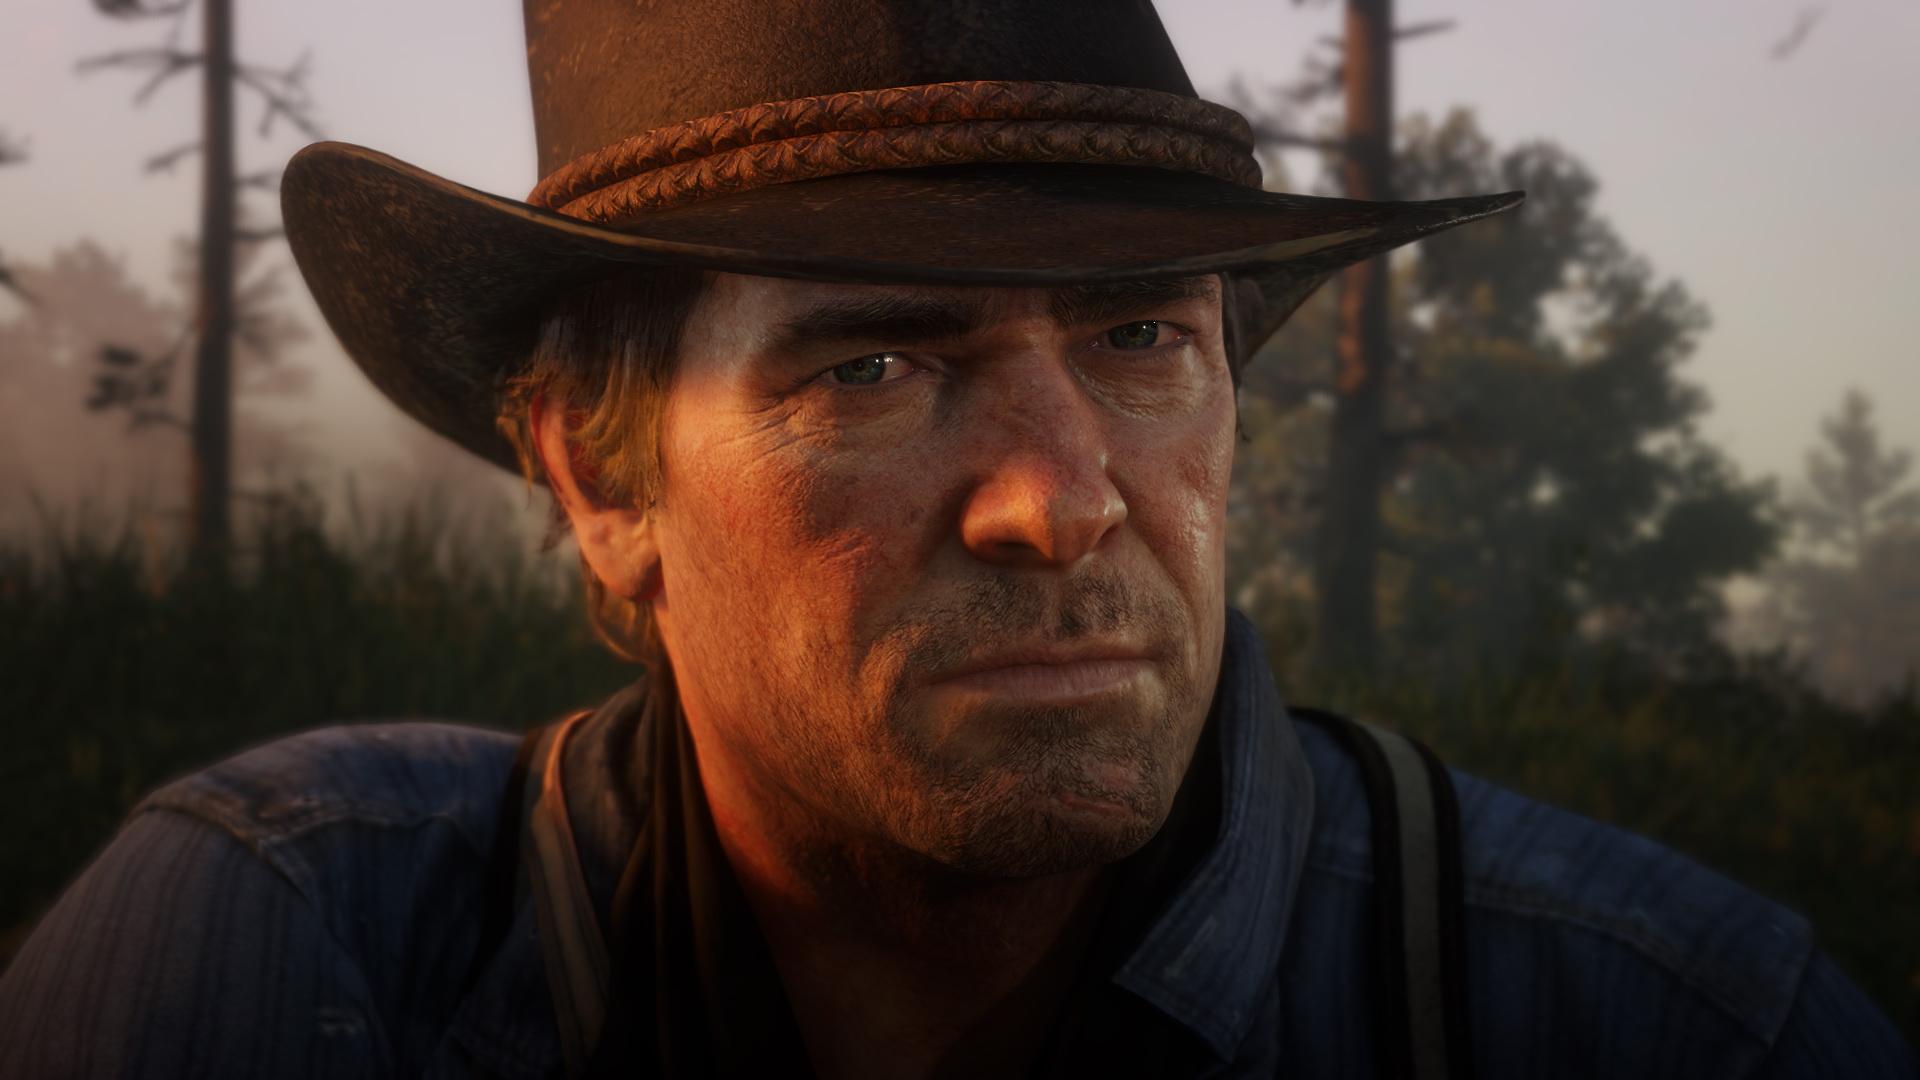 Red Dead Redemption 2 - Arthur Morgan close-up